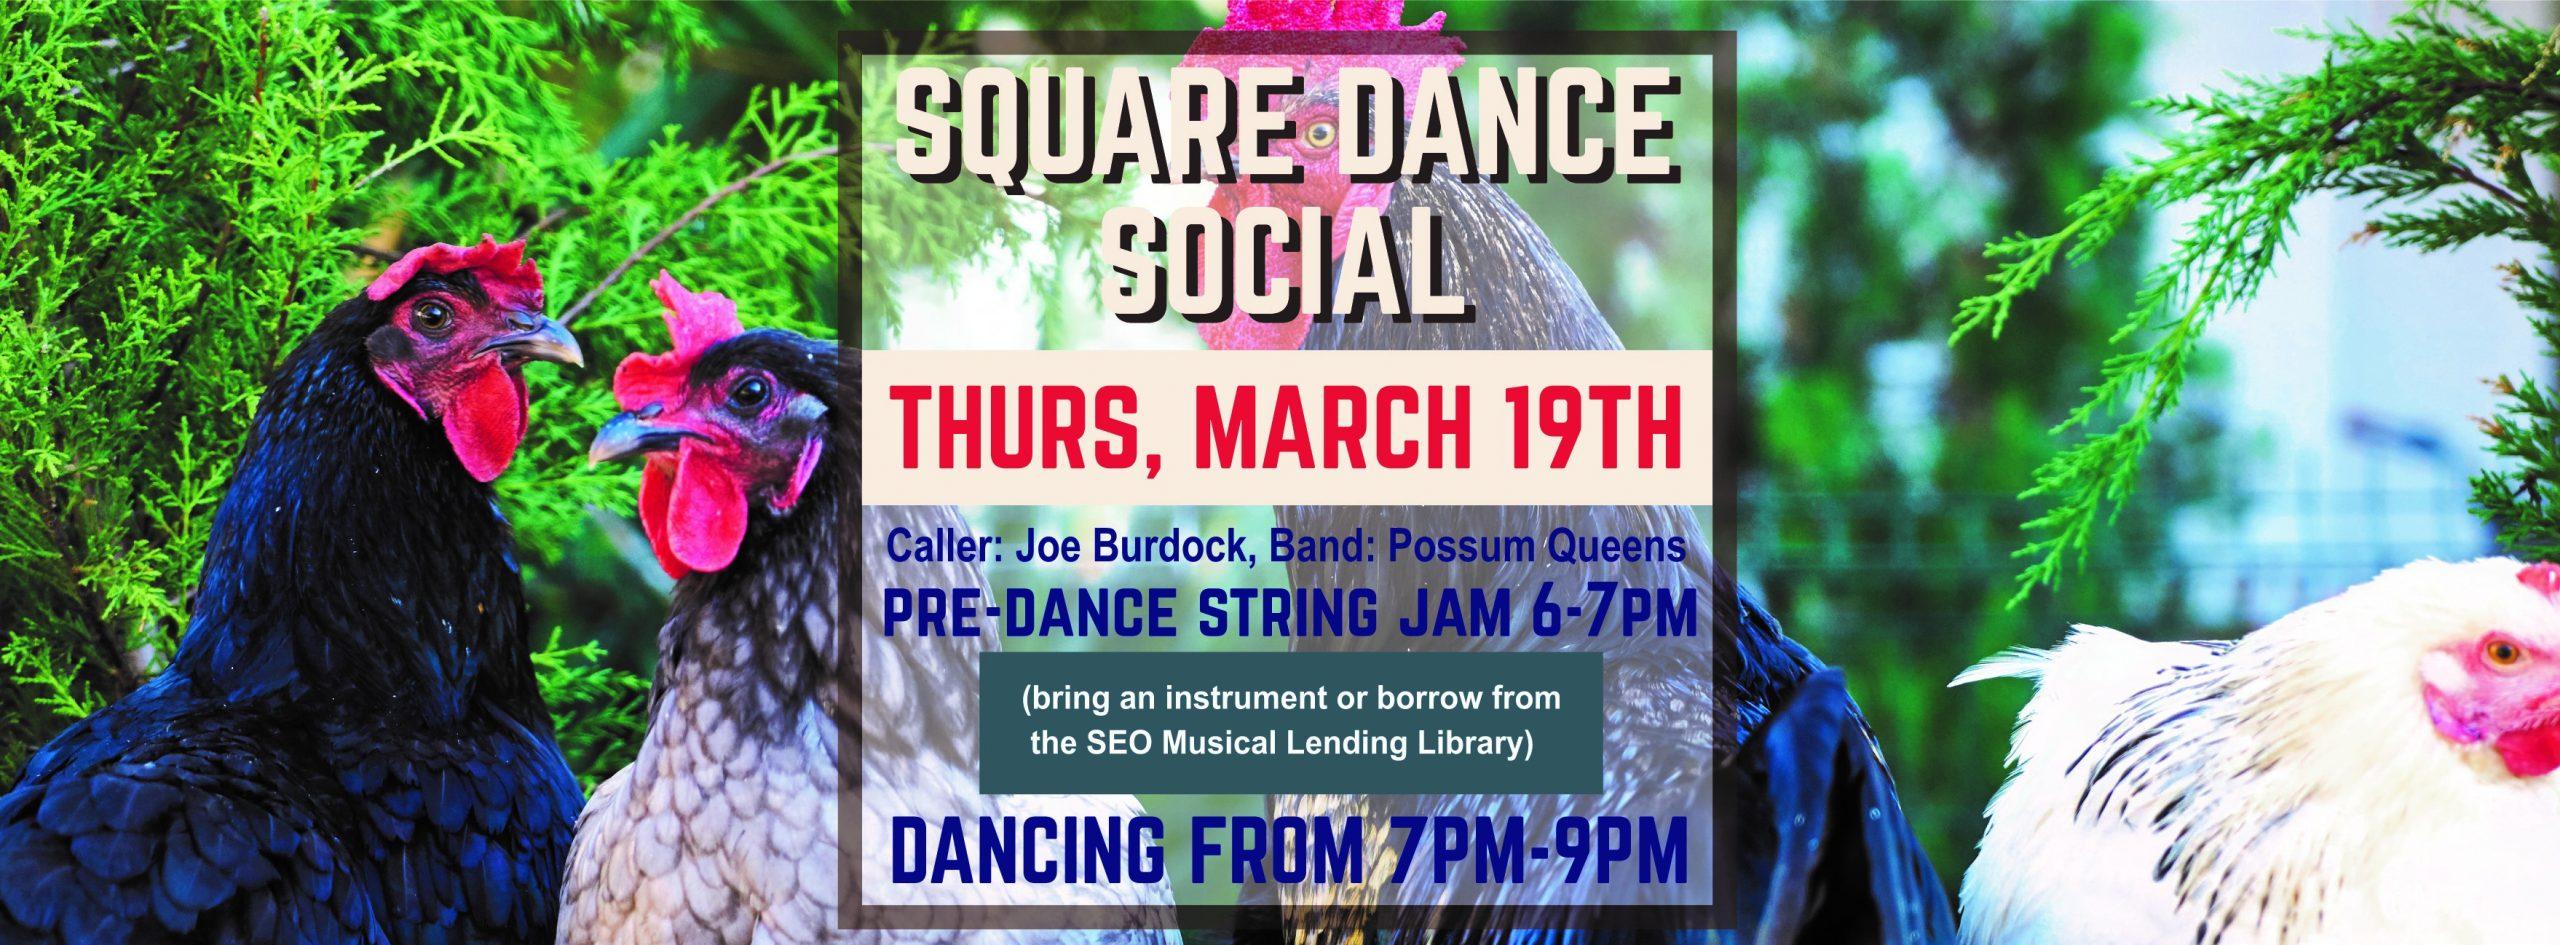 Square Dance Social flier